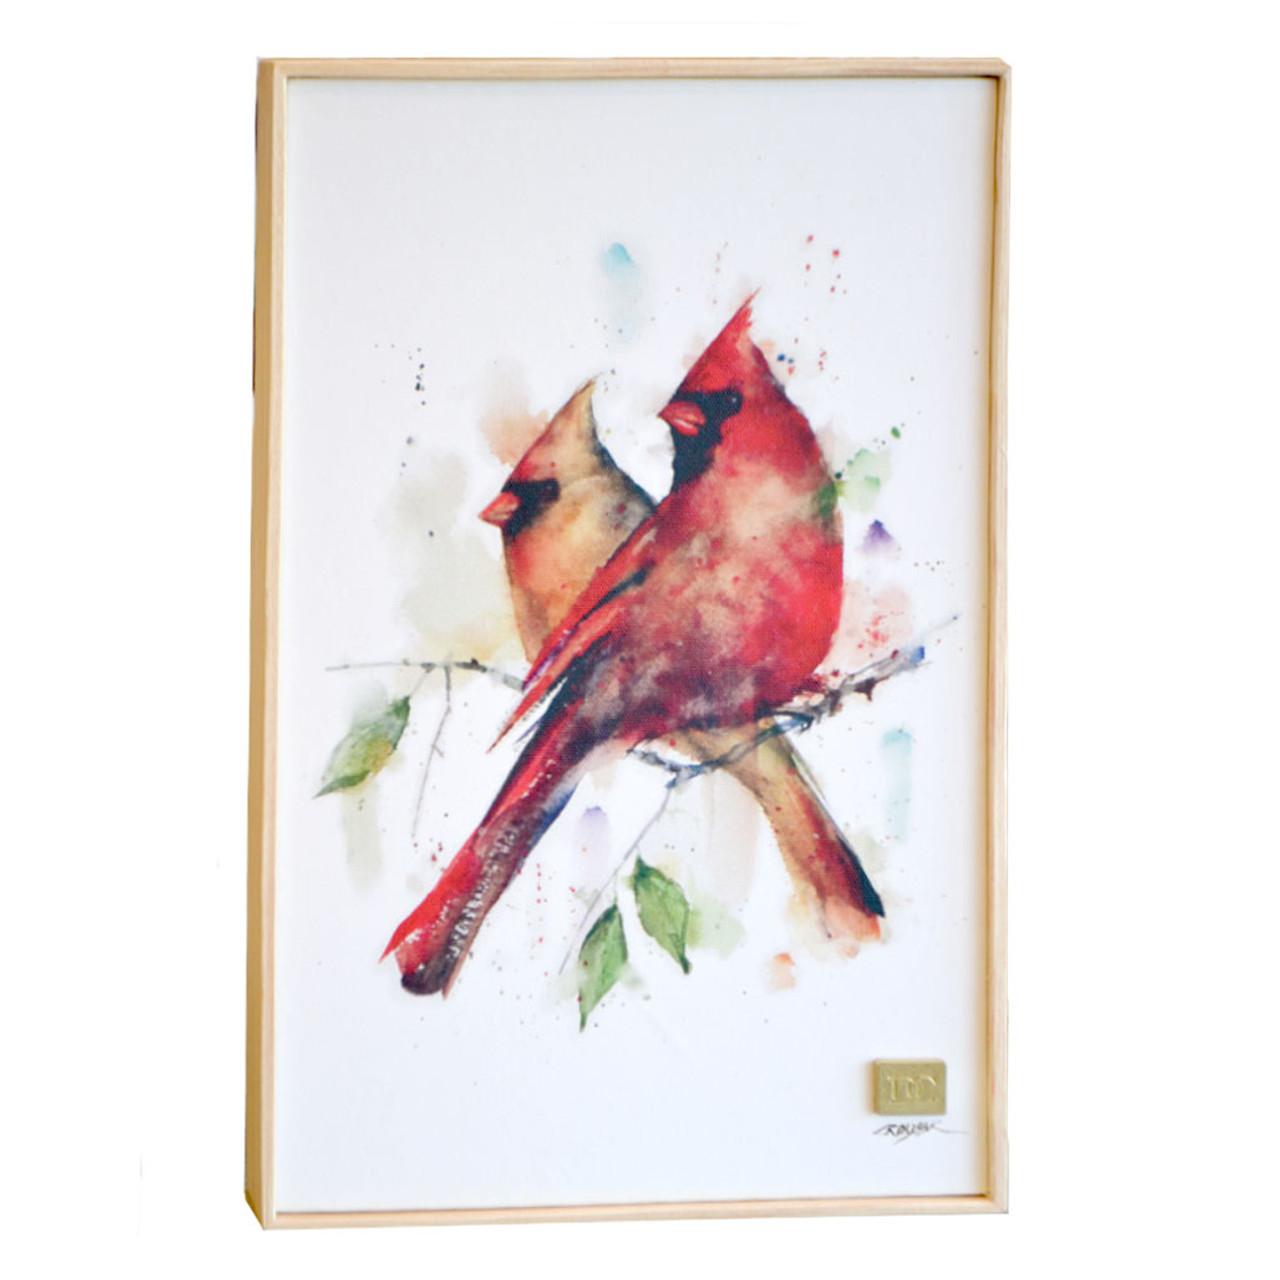 Pair of Cardinals Wall Art